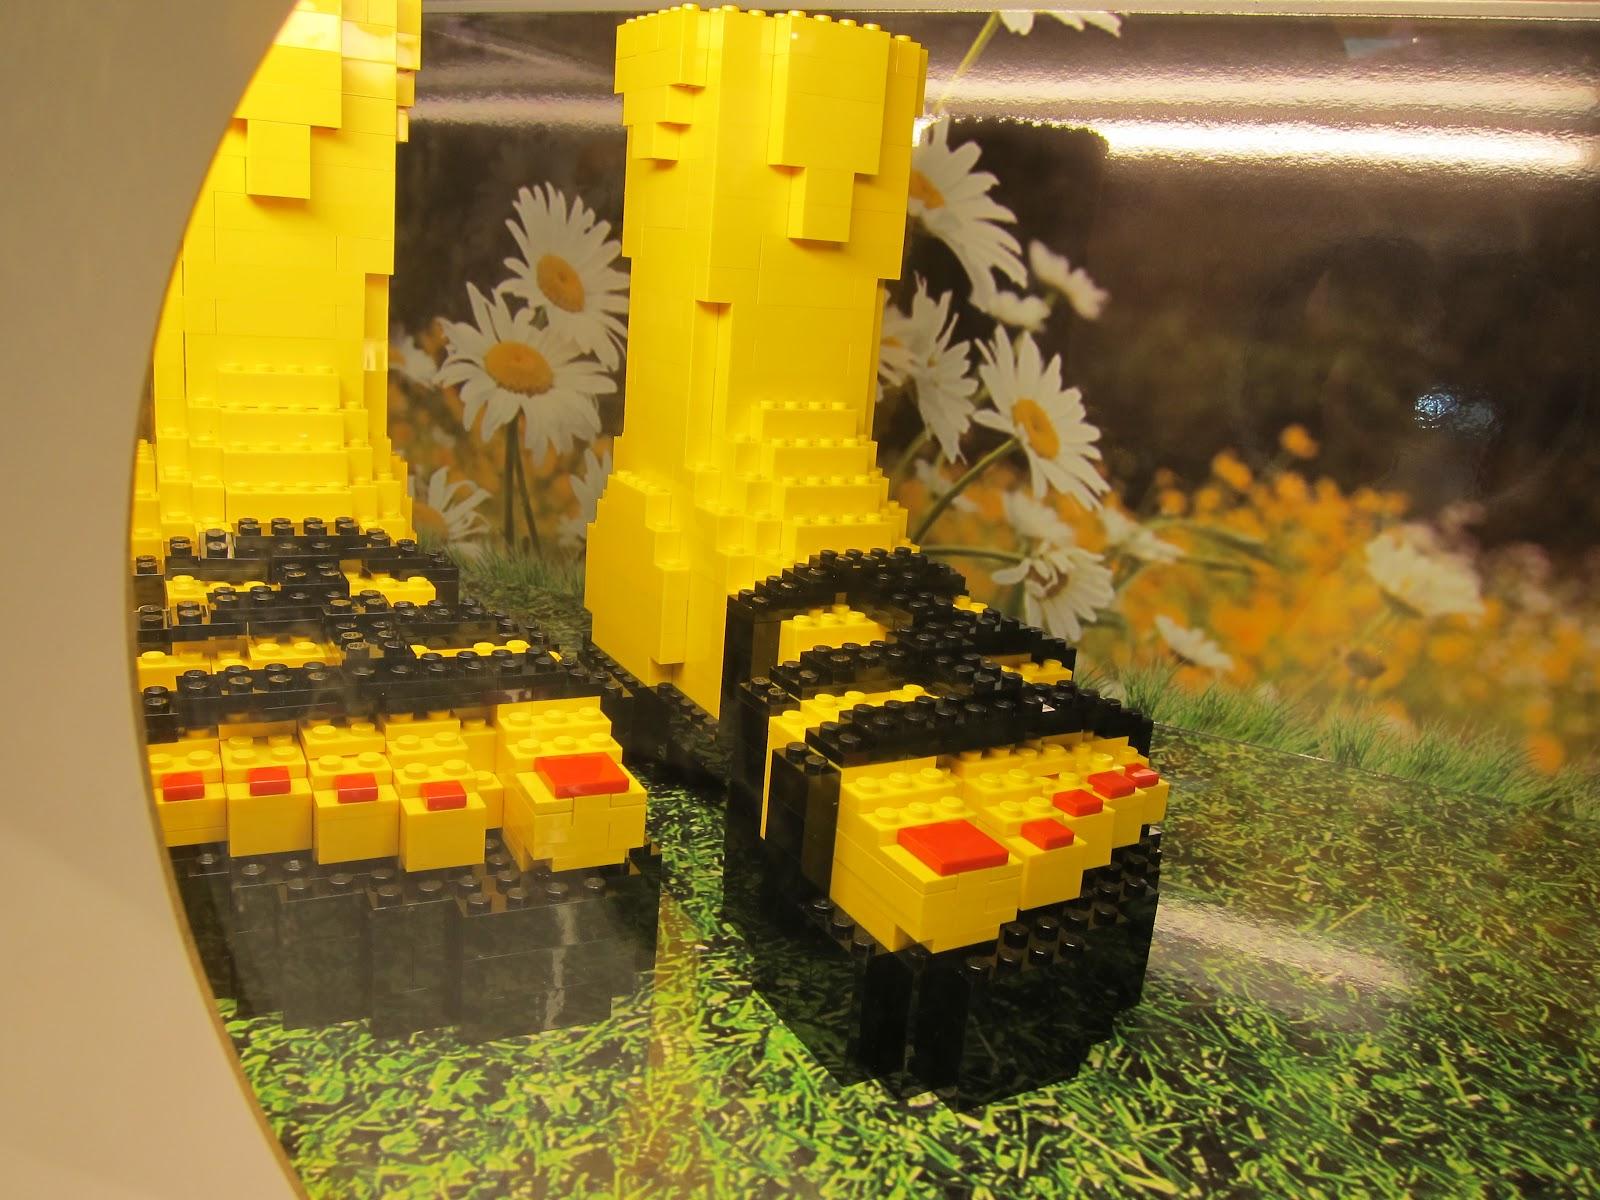 Buried in Bricks: Milwaukee (Wauwatosa) LEGO Store now open